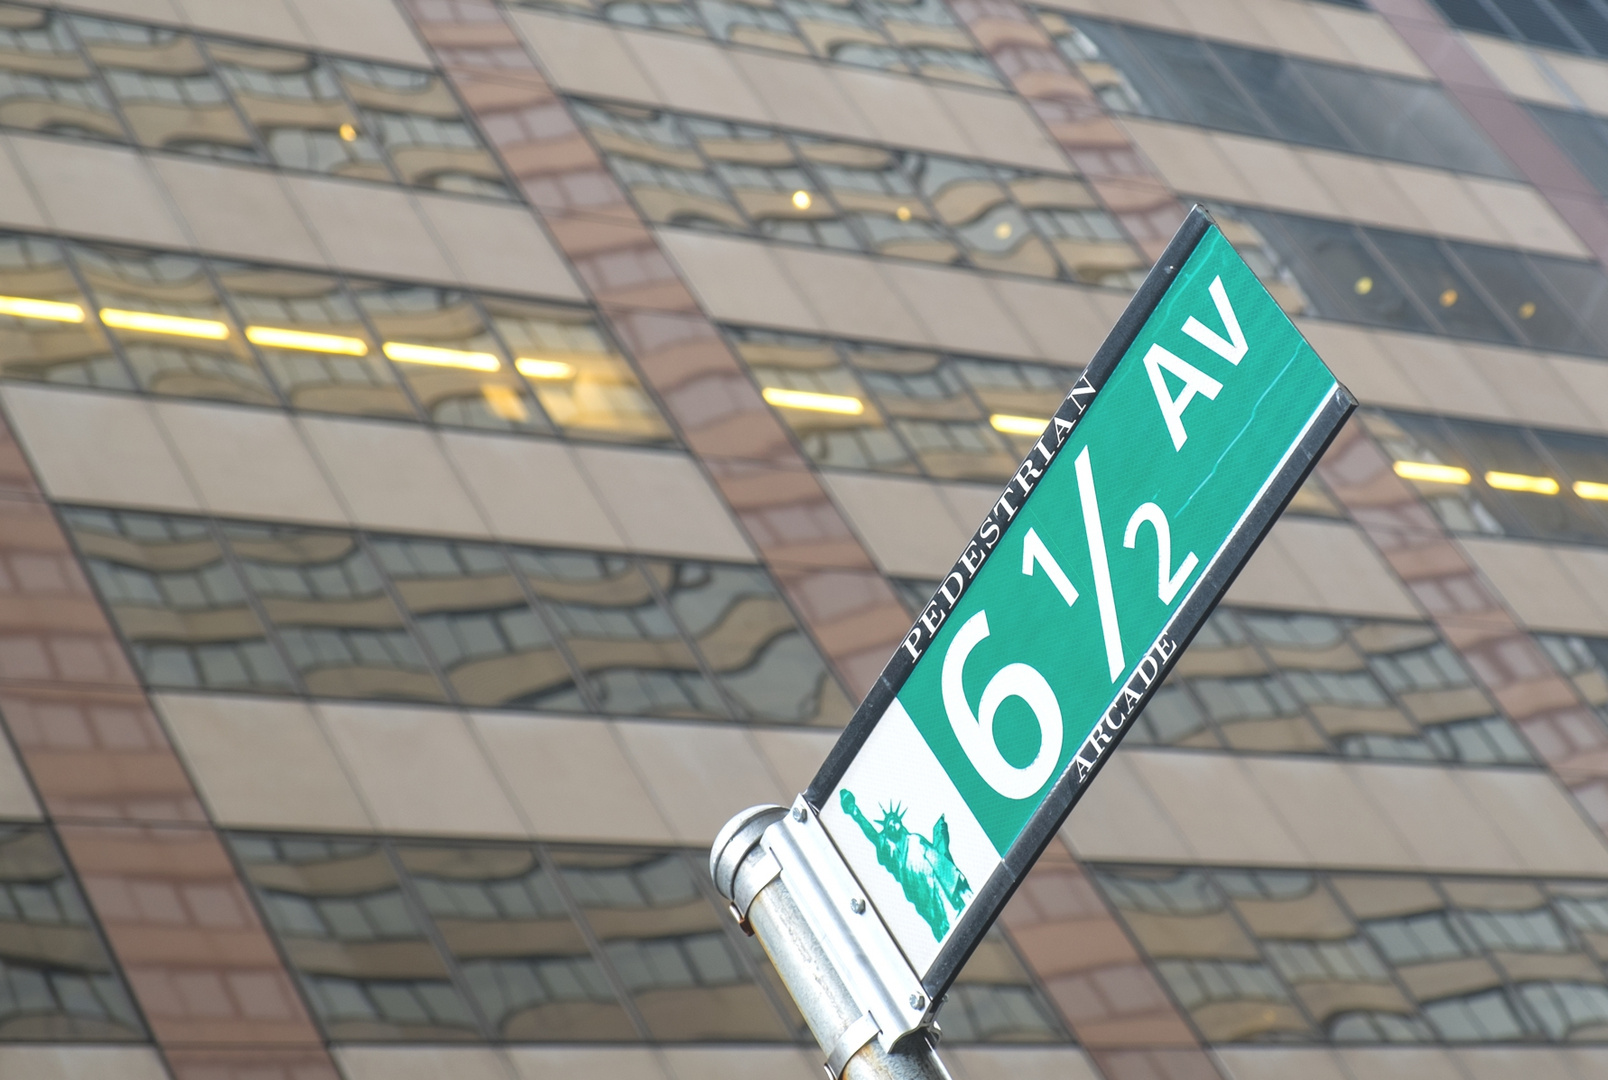 kurios - 6 1/2 Avenue